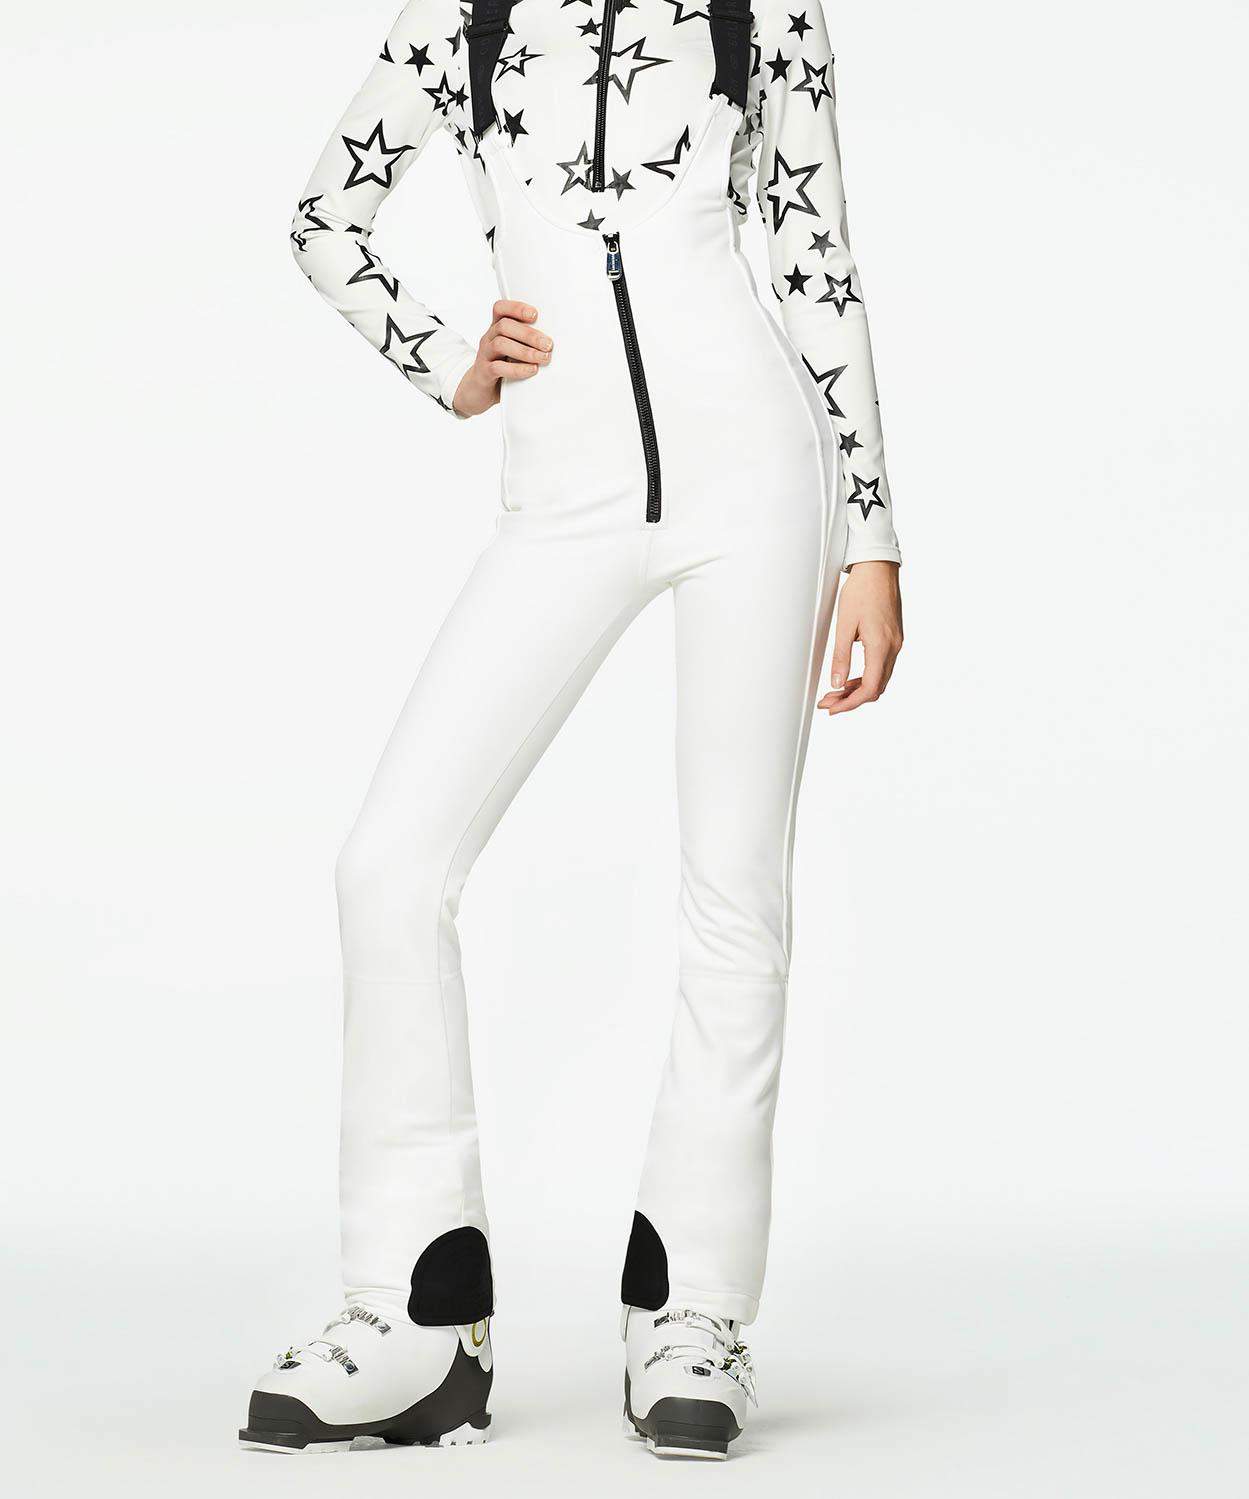 Women's Phoebe Overall Ski Pant